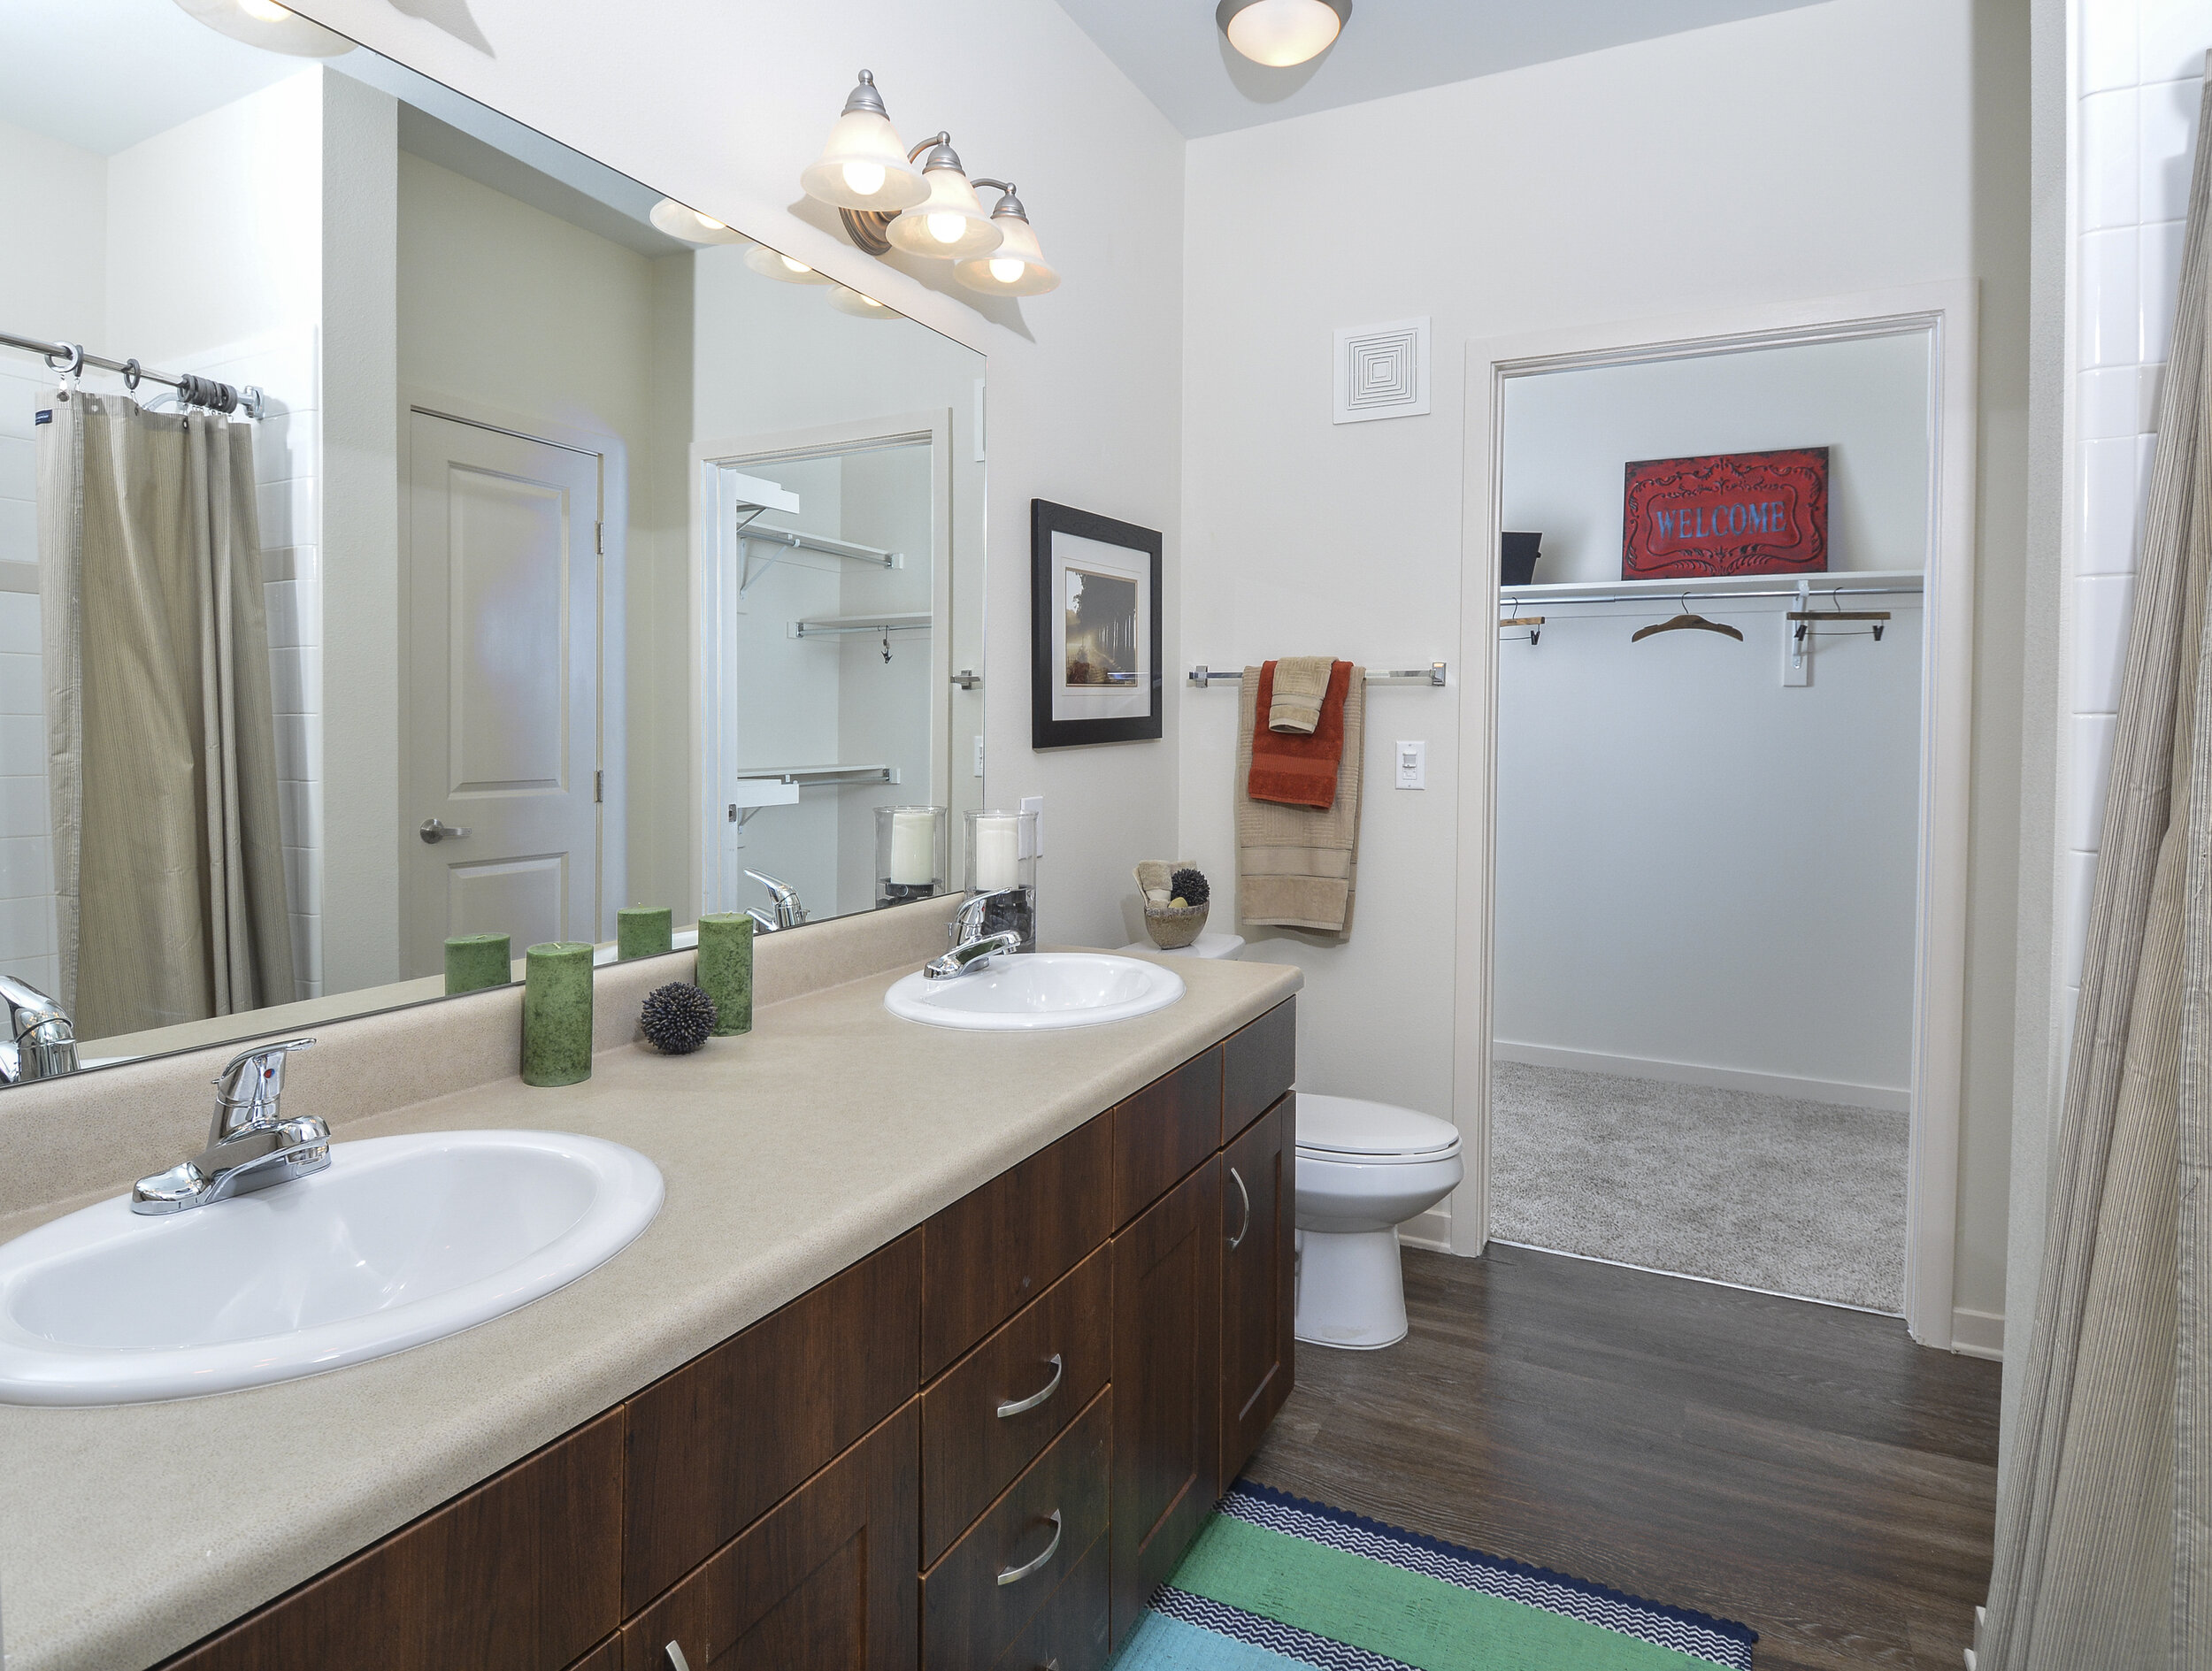 08-Stylish Bathrooms Feature Quartz Bath Countertops.jpg